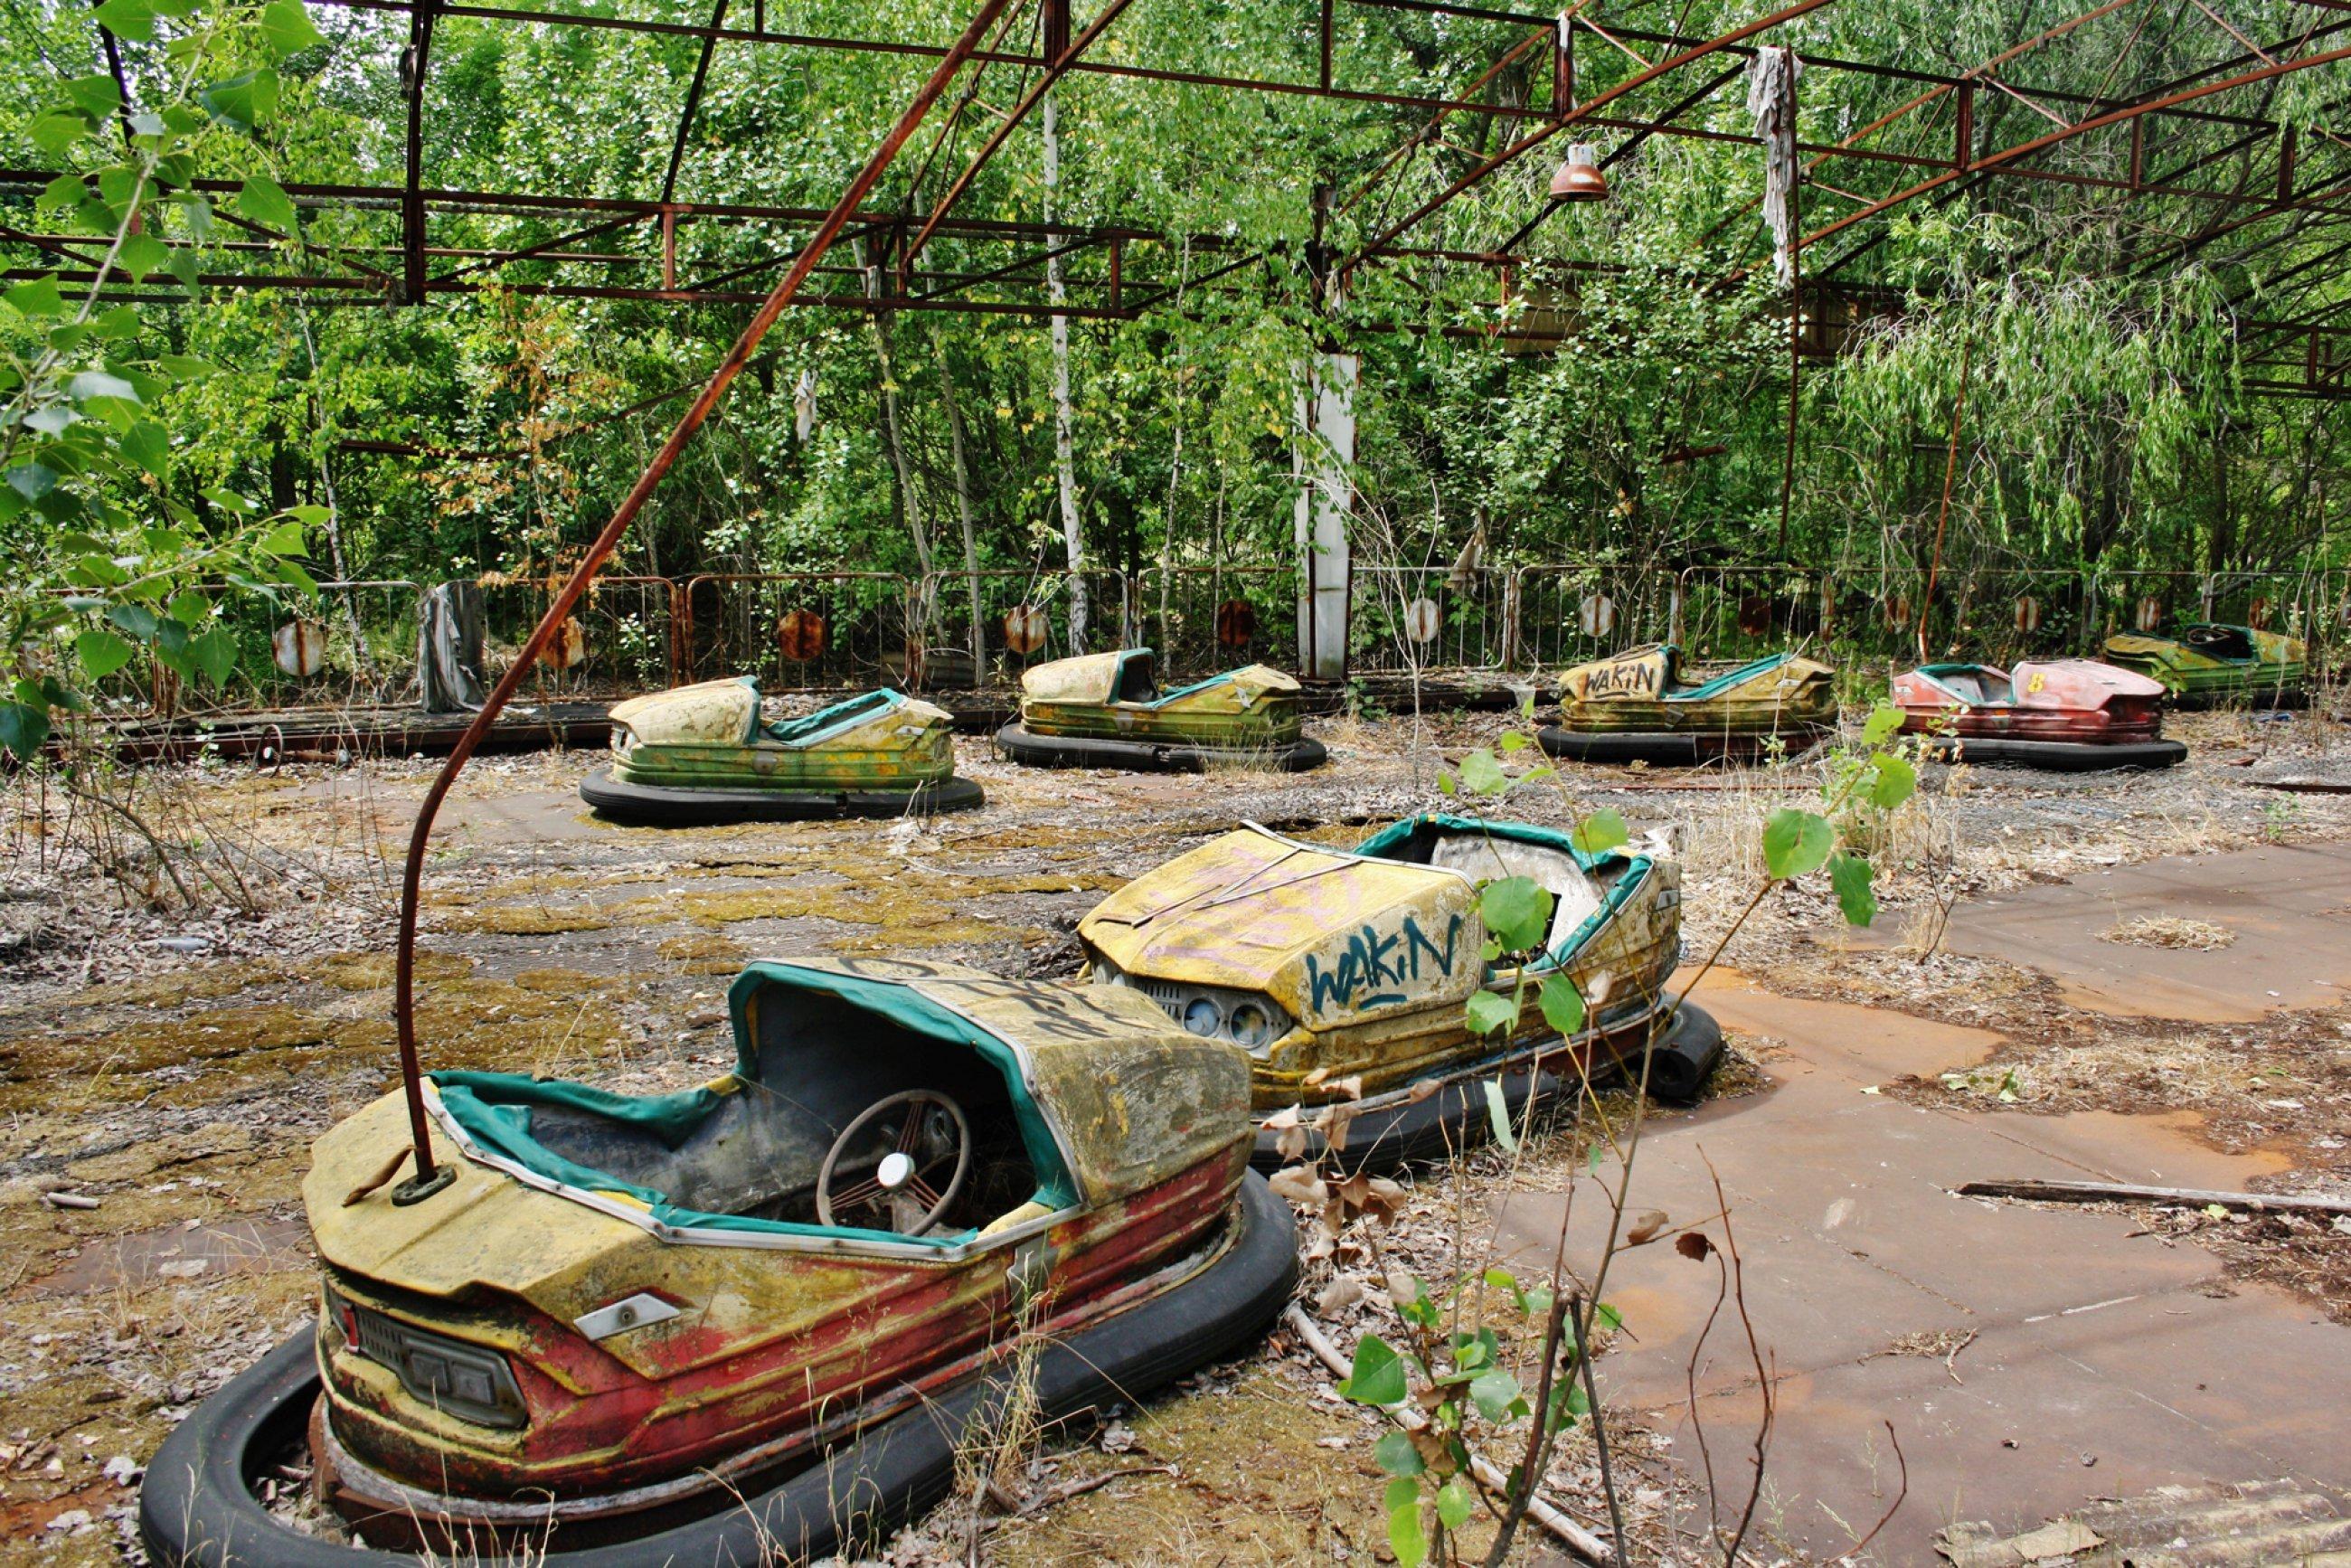 https://bubo.sk/uploads/galleries/5056/0hlavna-cernobyl-martin-navratil-2015-img-8092-4-.jpg